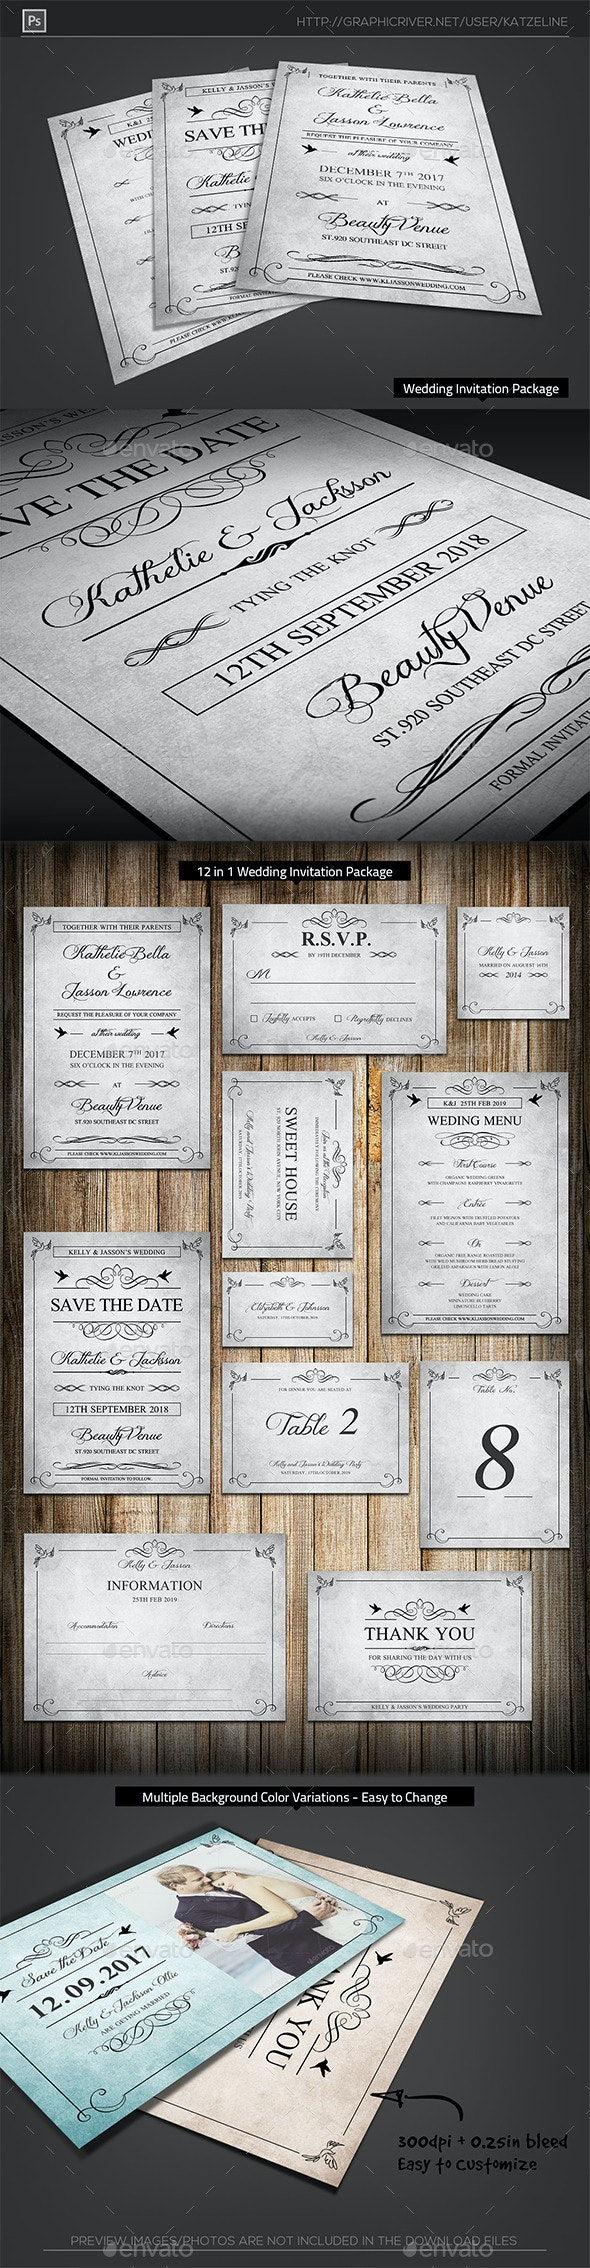 Classic Vintage - Wedding Invitation Package